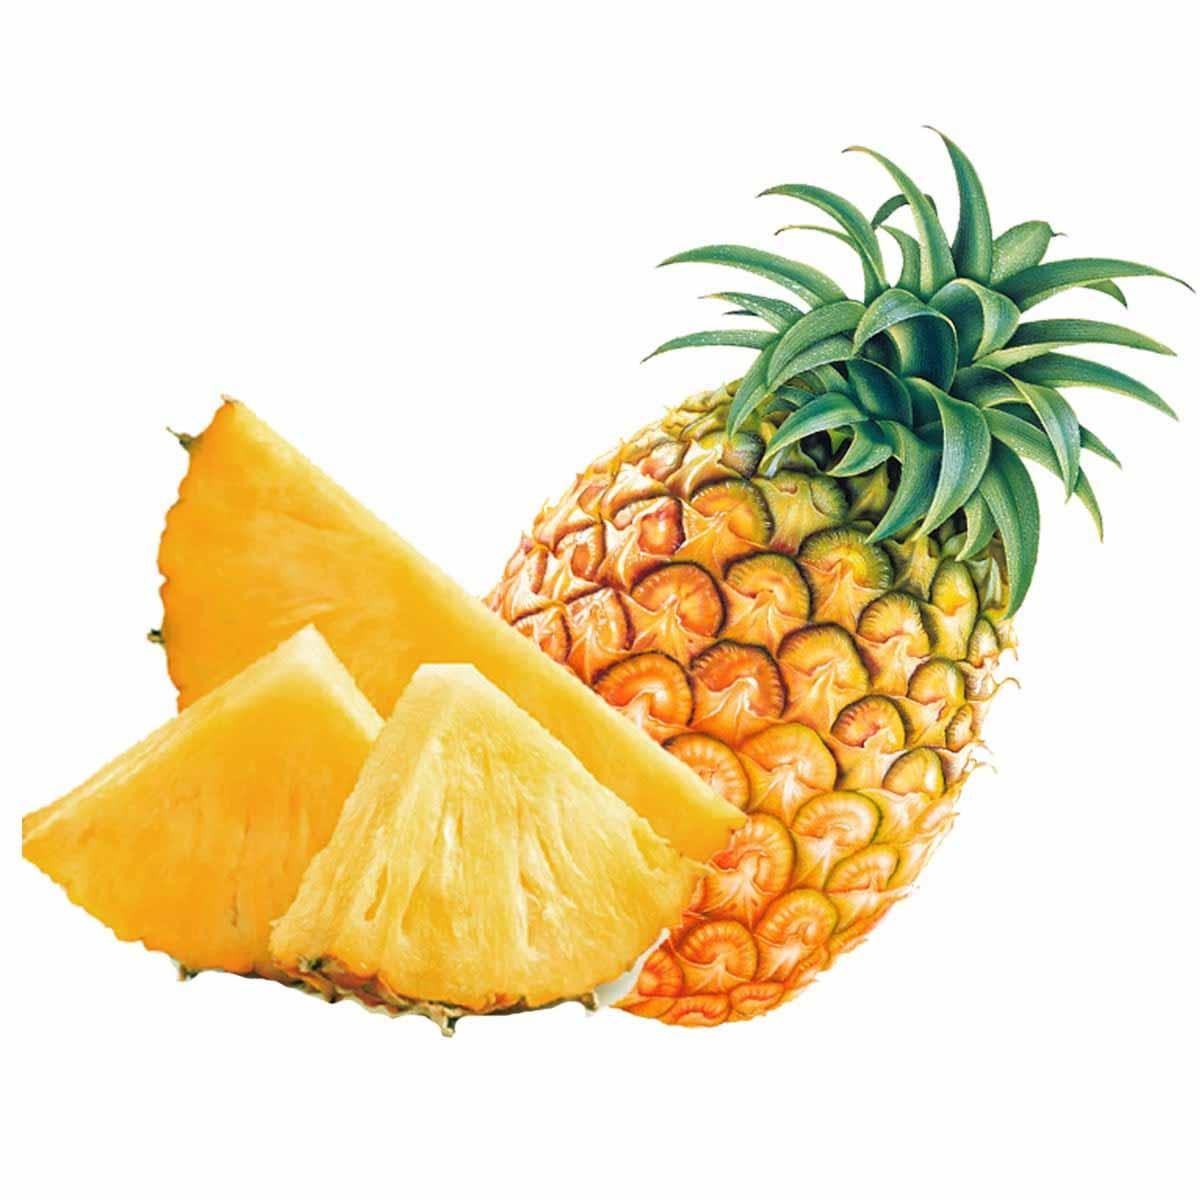 Indian Pineapple